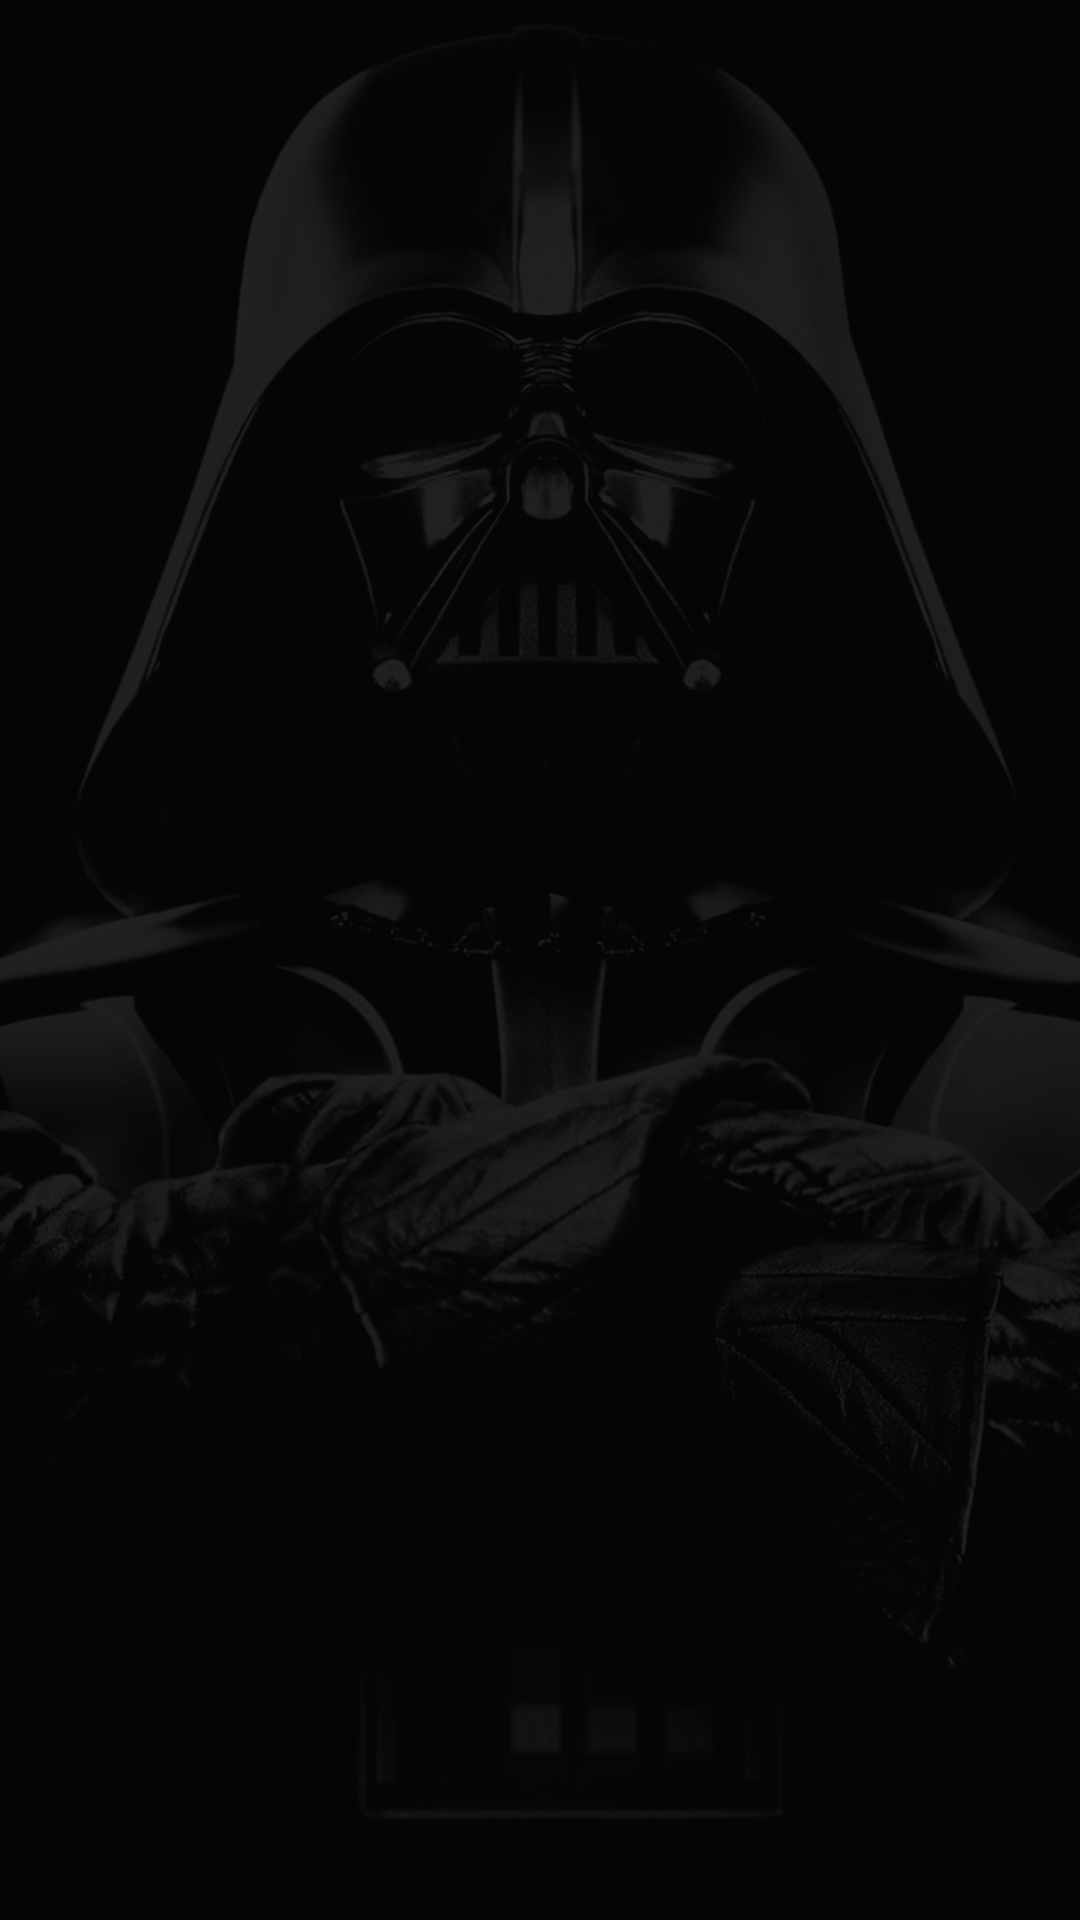 Mobile Darth Vader Wallpapers Wallpaper Cave